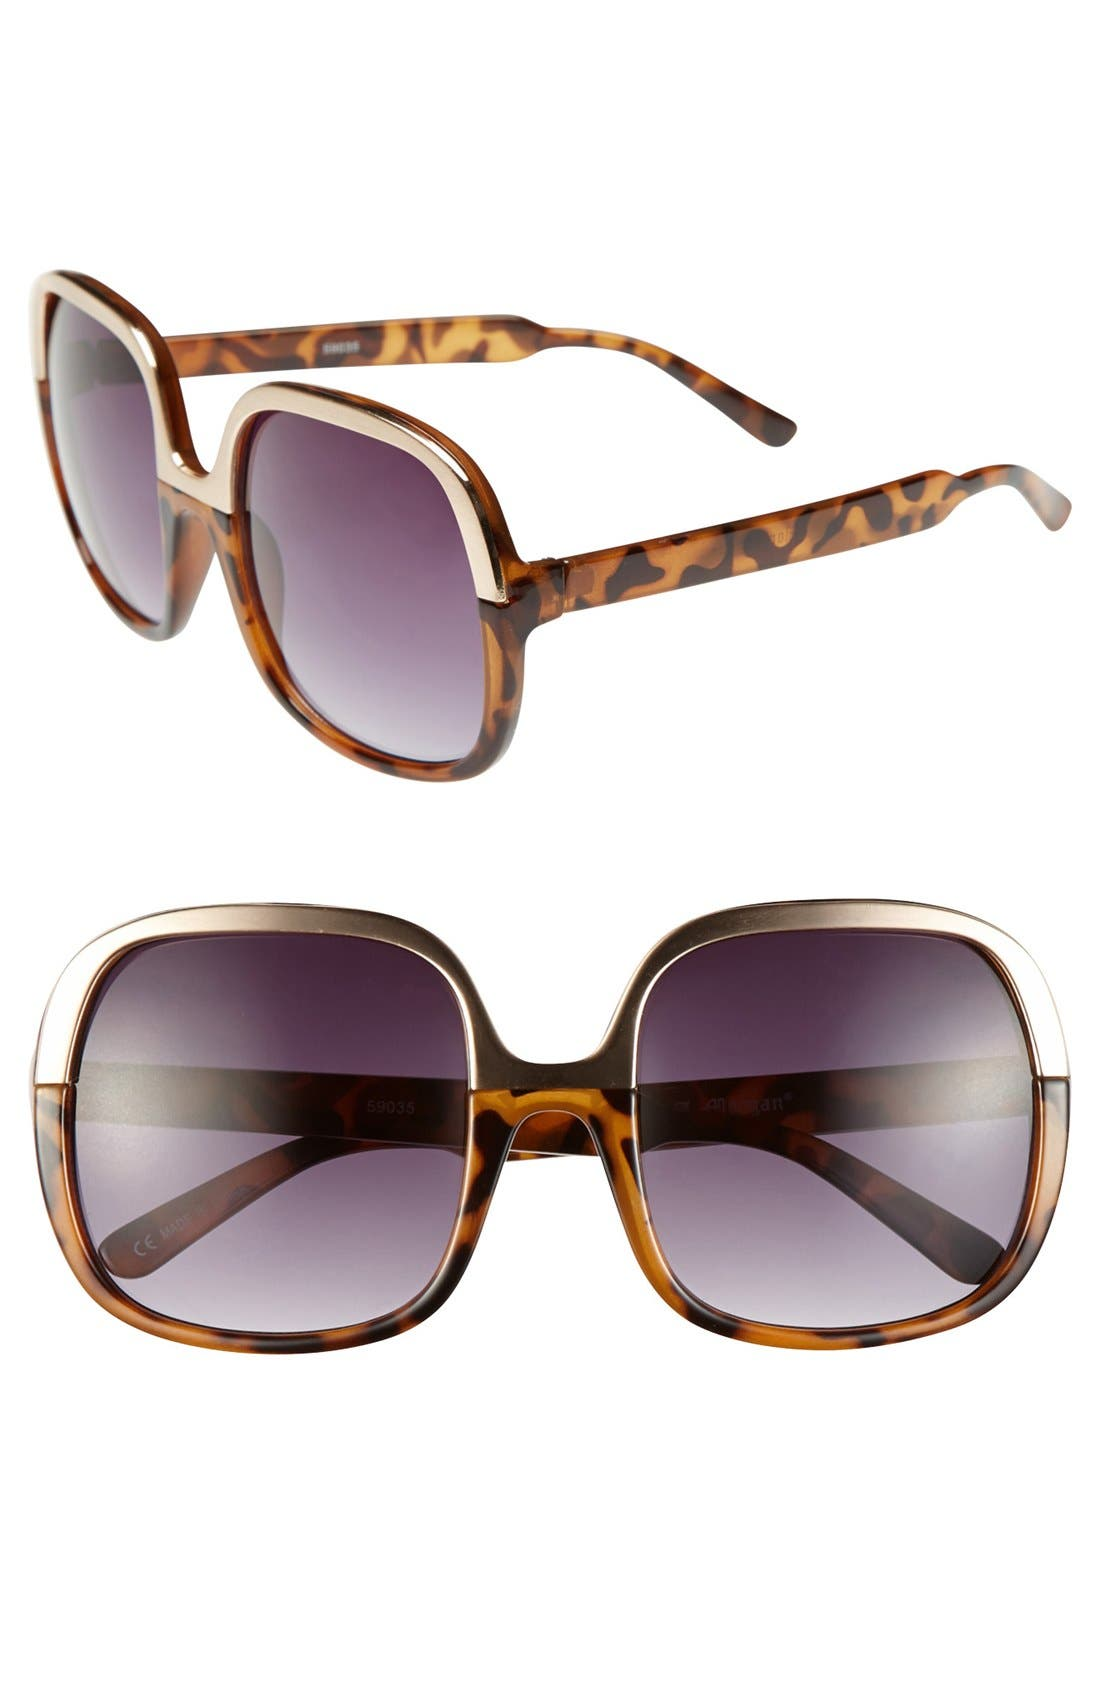 Main Image - A.J. Morgan 'Maya' 55mm Sunglasses